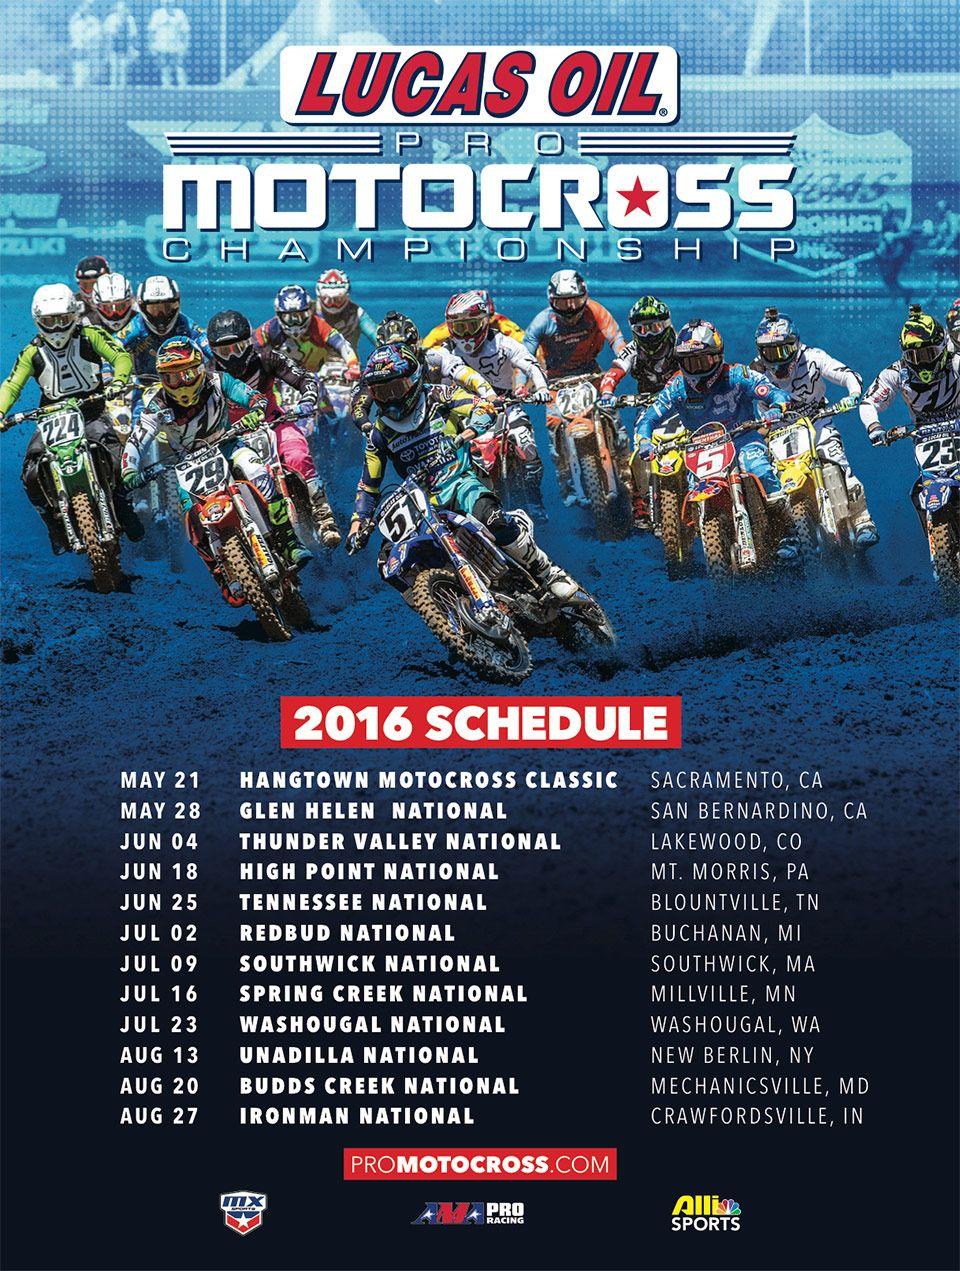 2016 Lucas OIl Pro Motocross Championship schedule